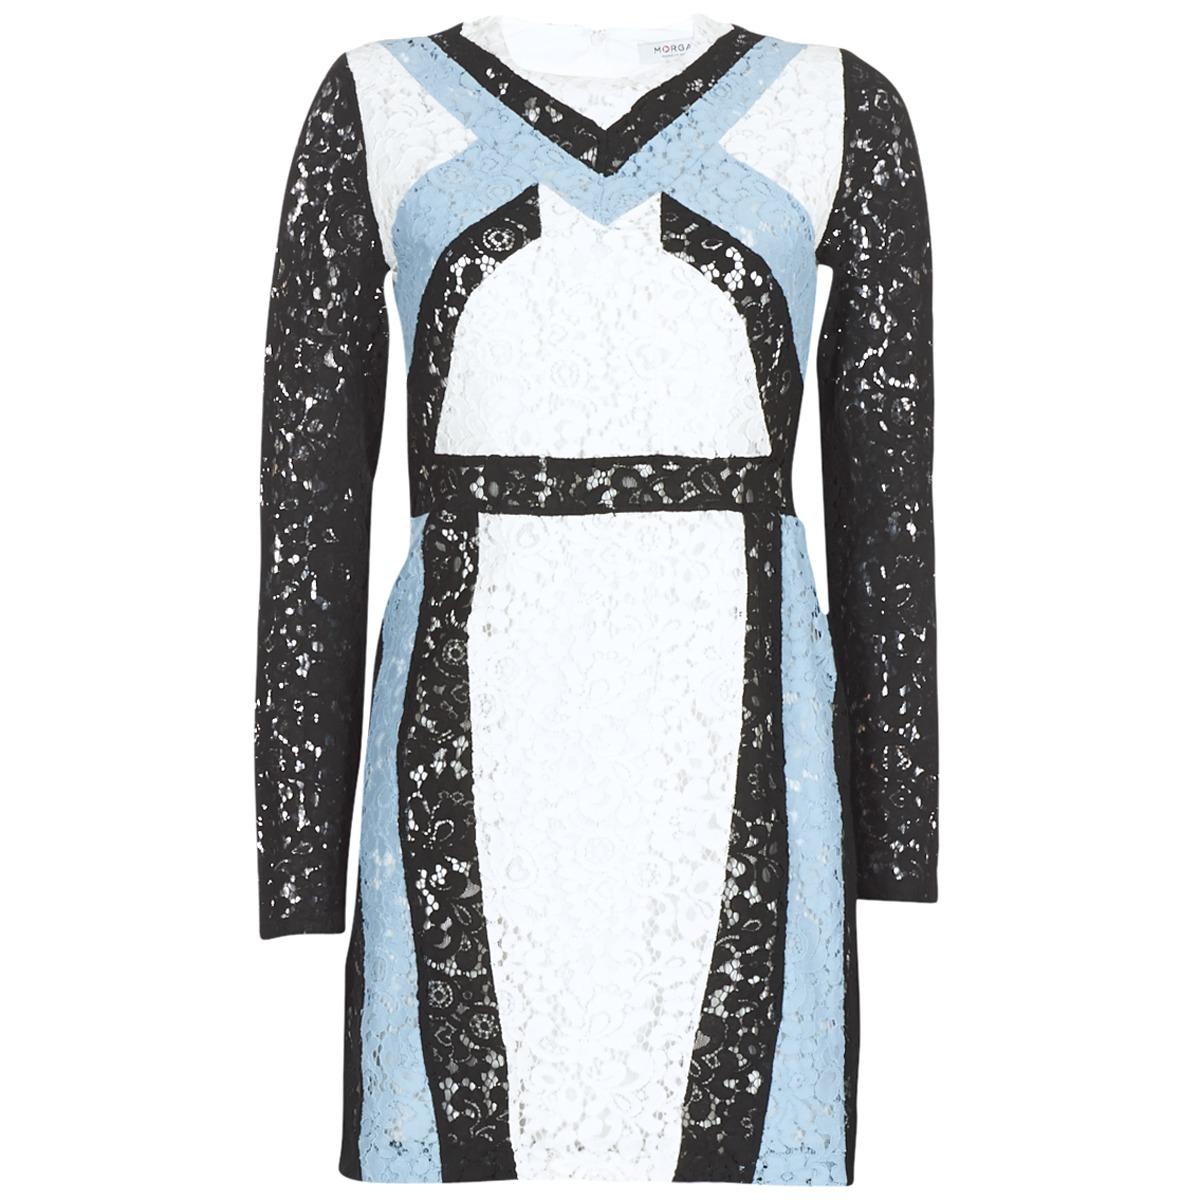 Morgan korte jurk rlixi wit